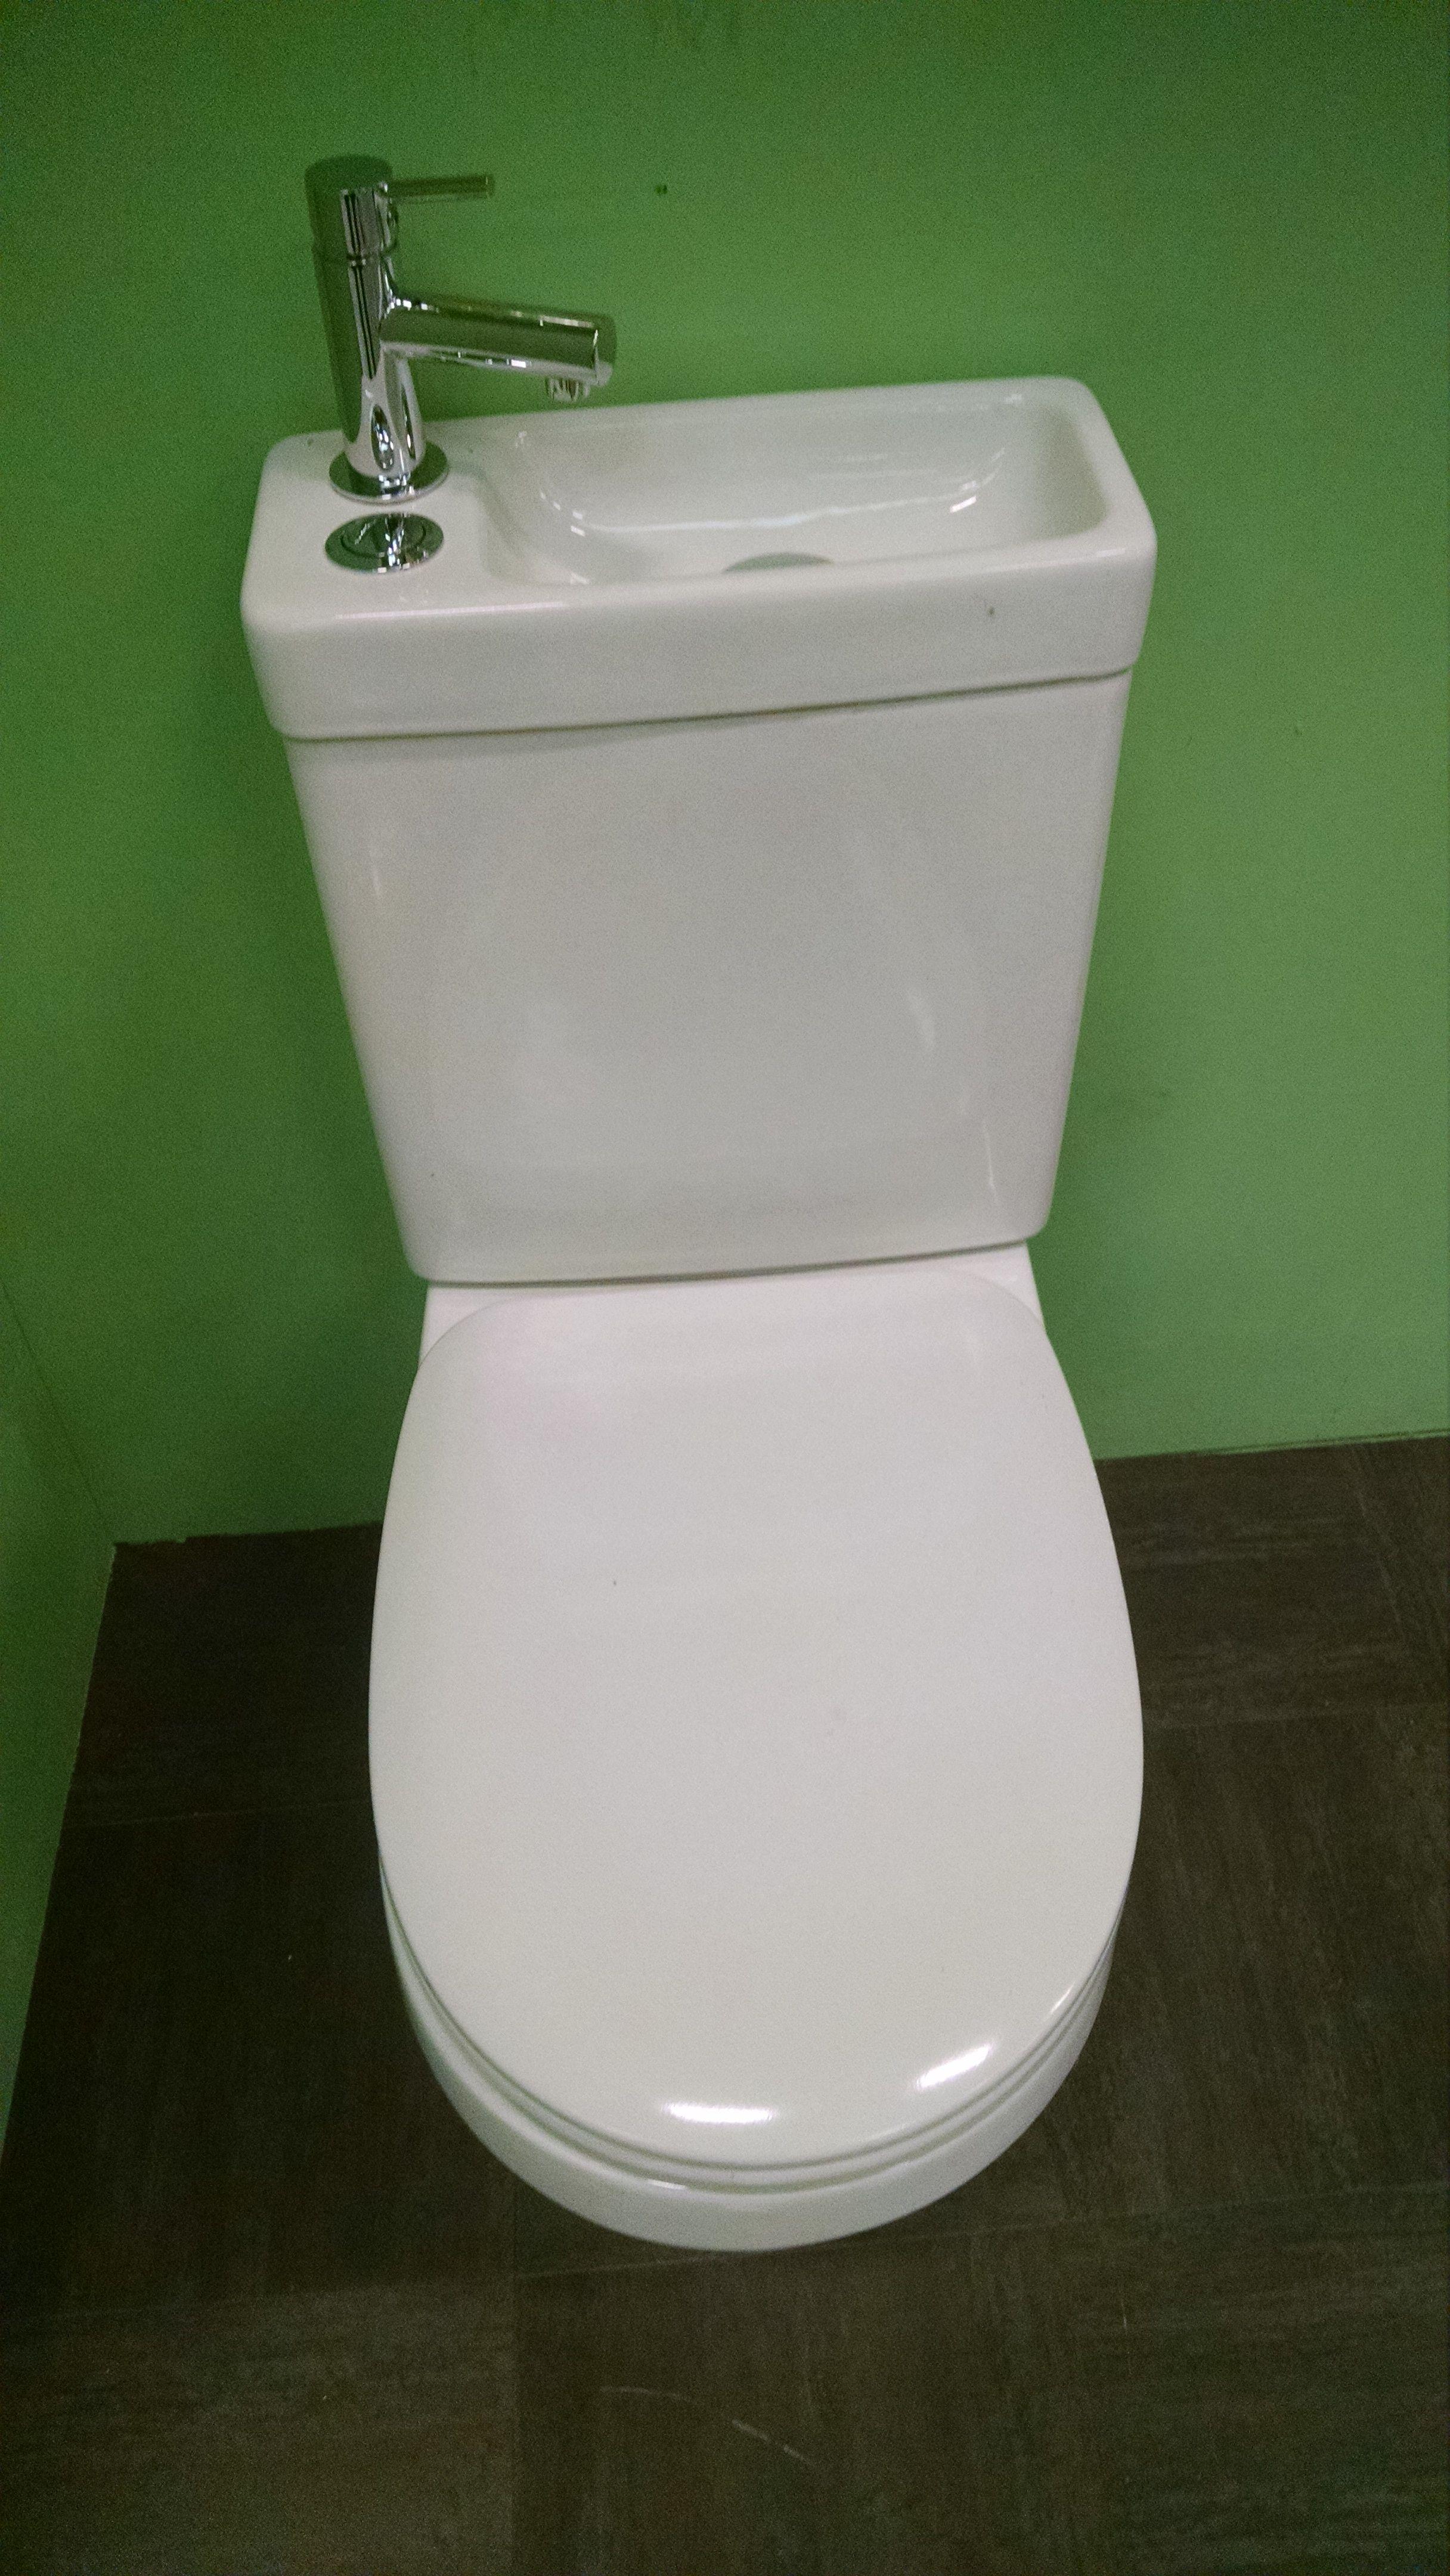 Toilet And Sink Together Toilets And Sinks Minimalist Bathroom Diy Bathroom Design [ 4320 x 2432 Pixel ]